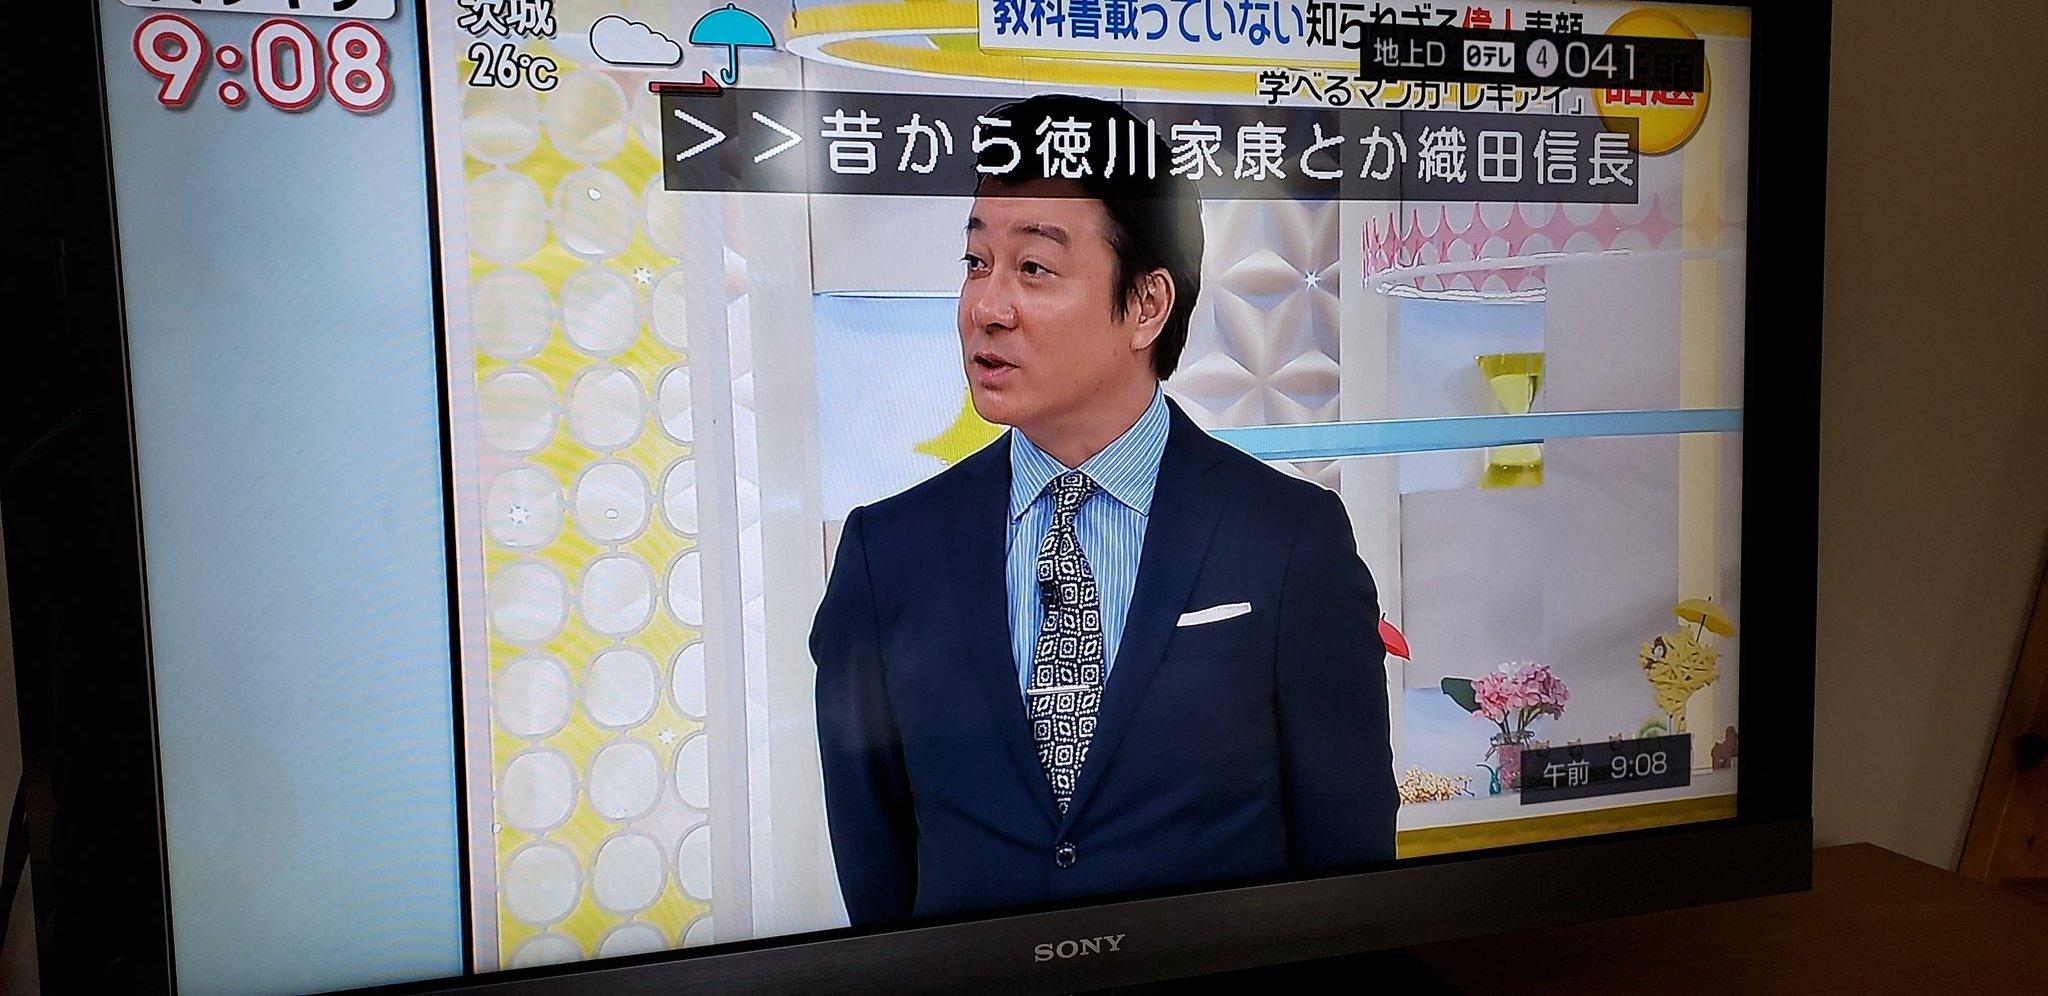 浩次 の 窓 社会 加藤